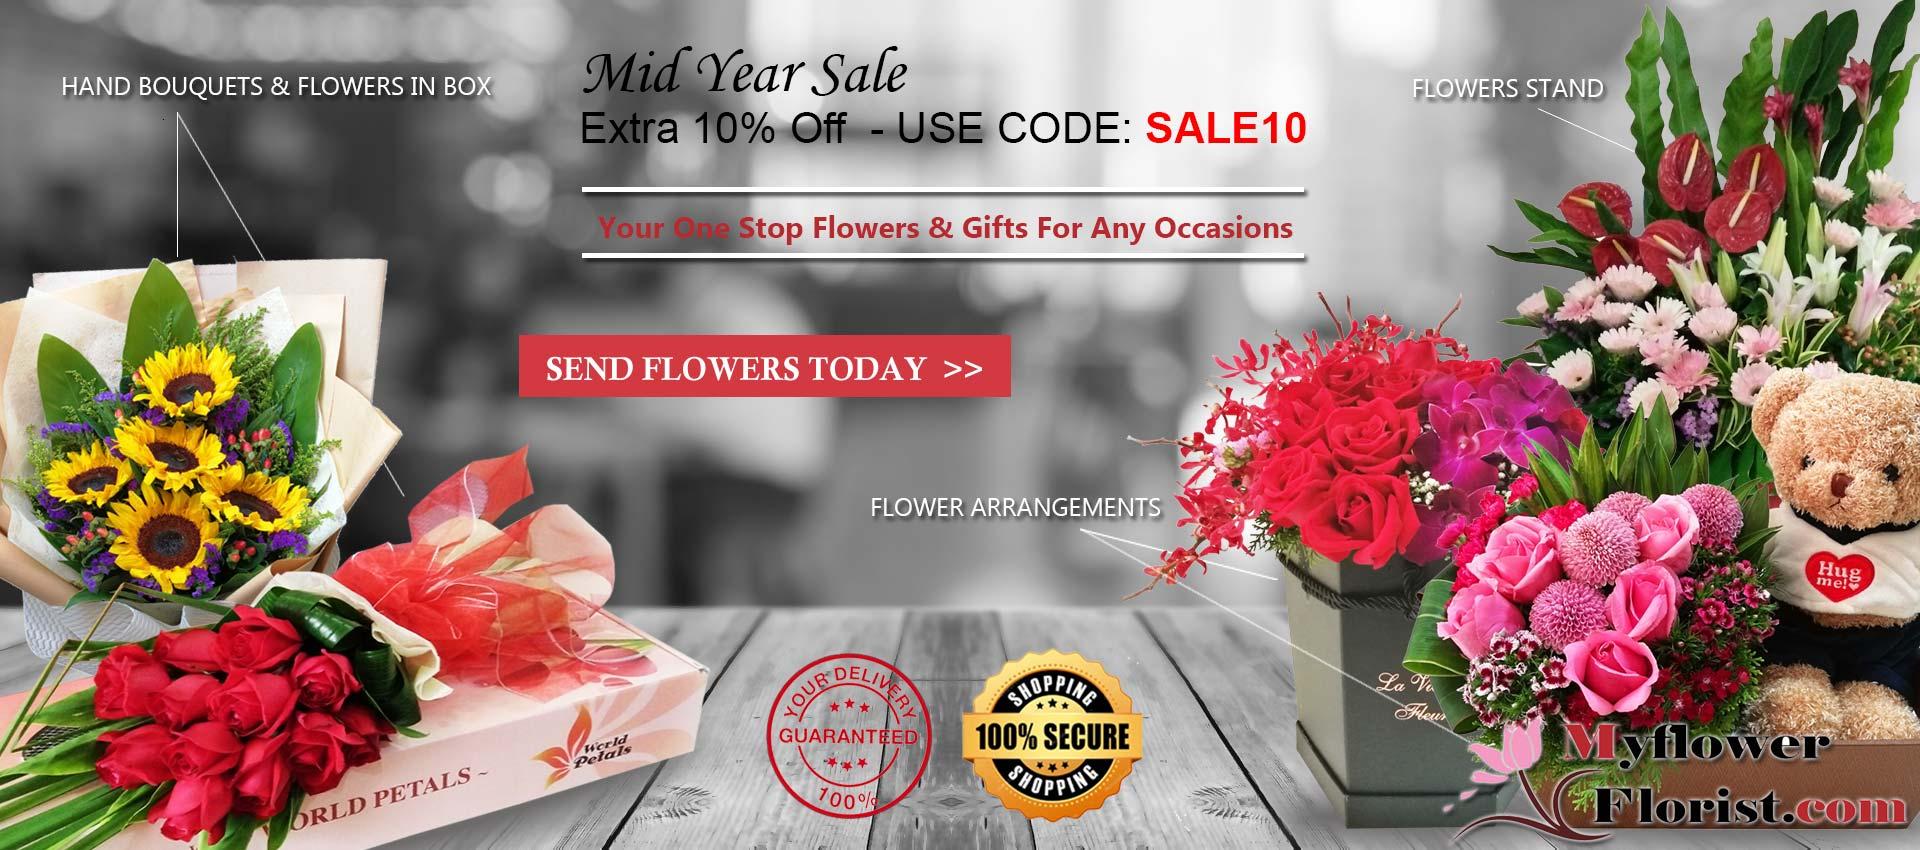 Malaysia Best Online Florist | Myflowerflorist.com